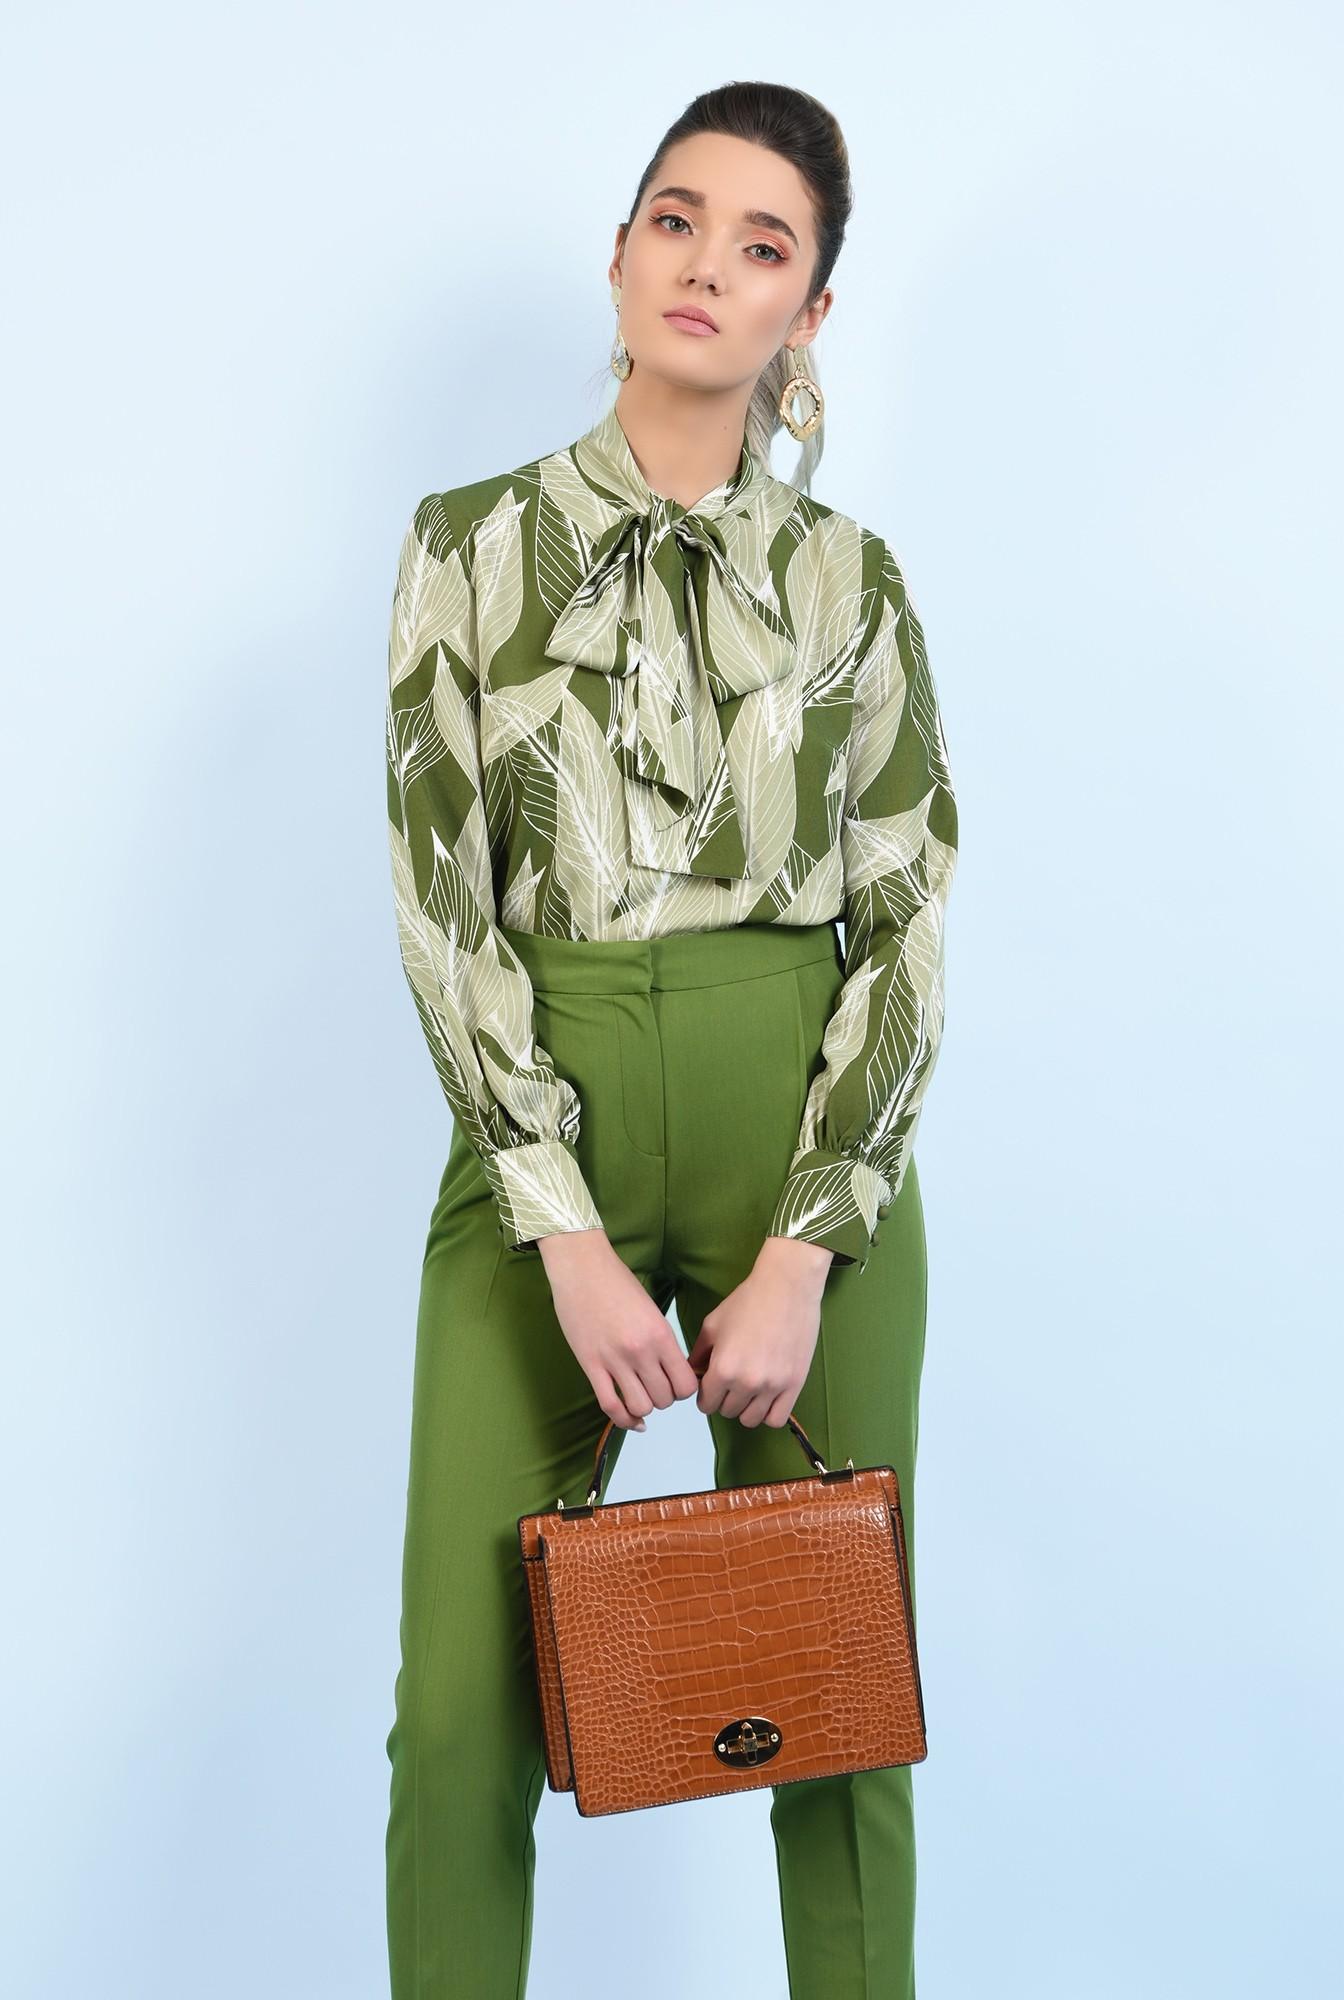 0 - bluza casual, cu imprimeu, maneci lungi, bluza de primavara